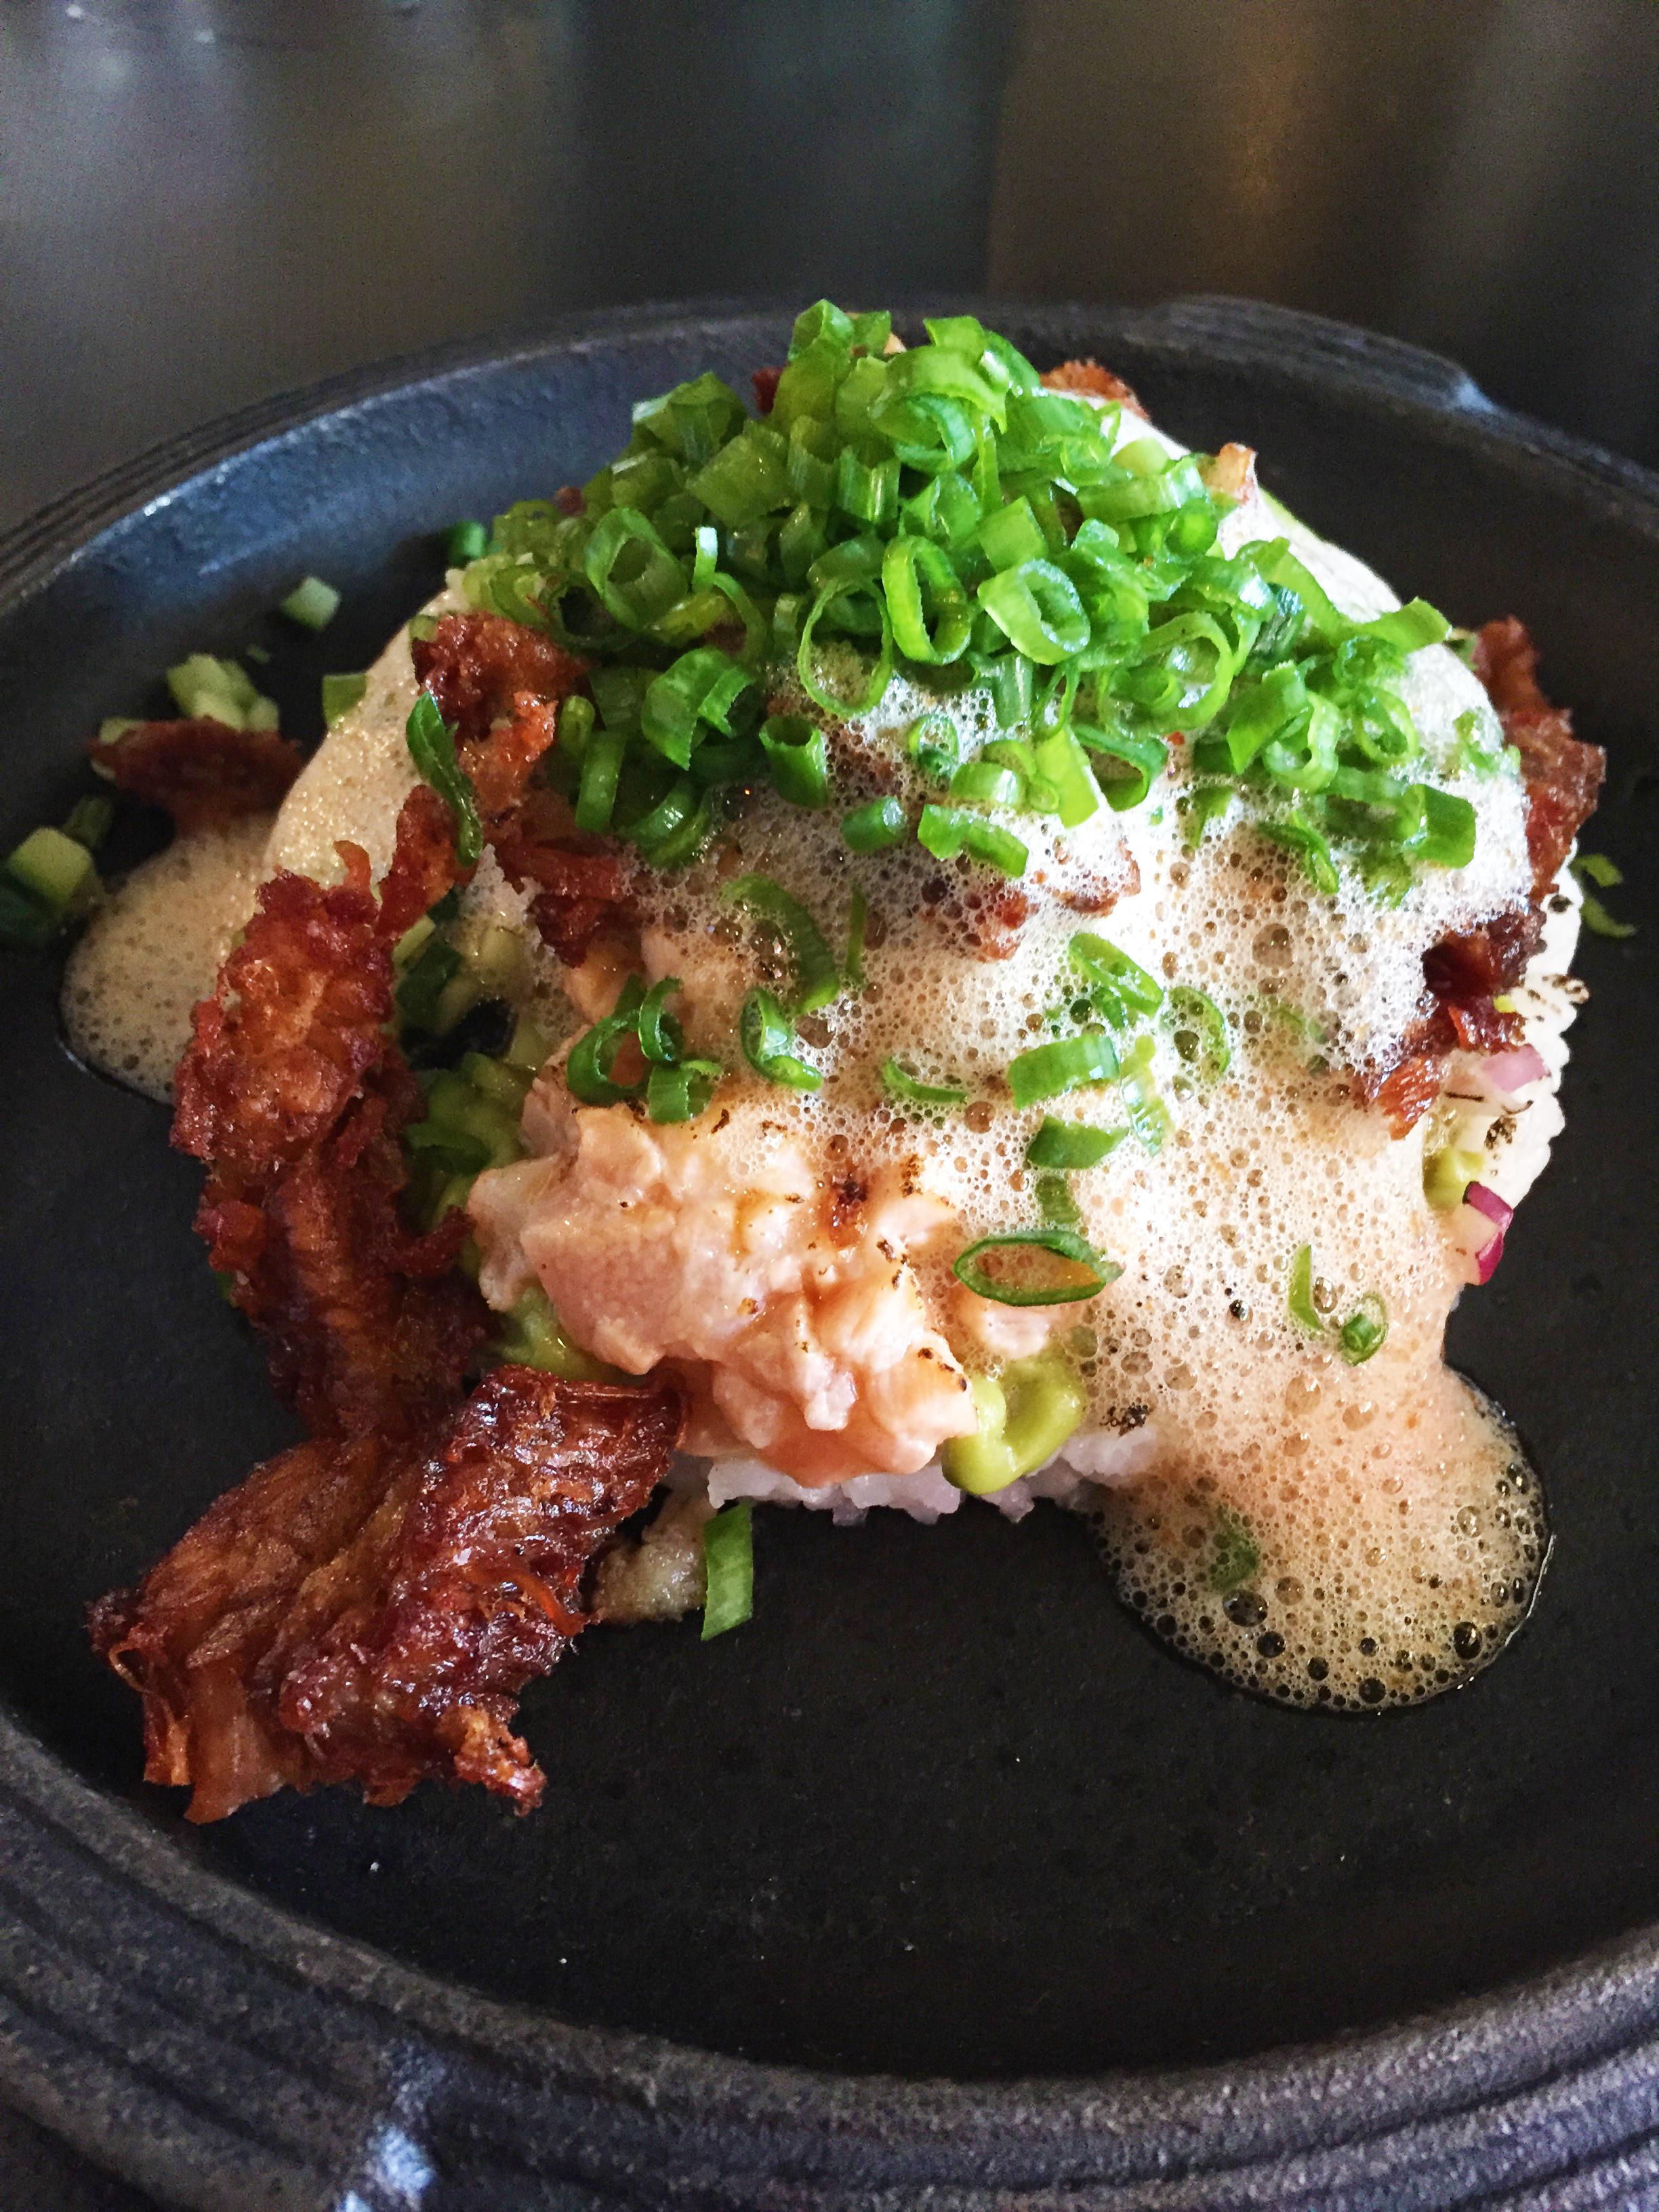 Dirty Rice with sushi rice, crispy pork belly, and salmon sashimi.